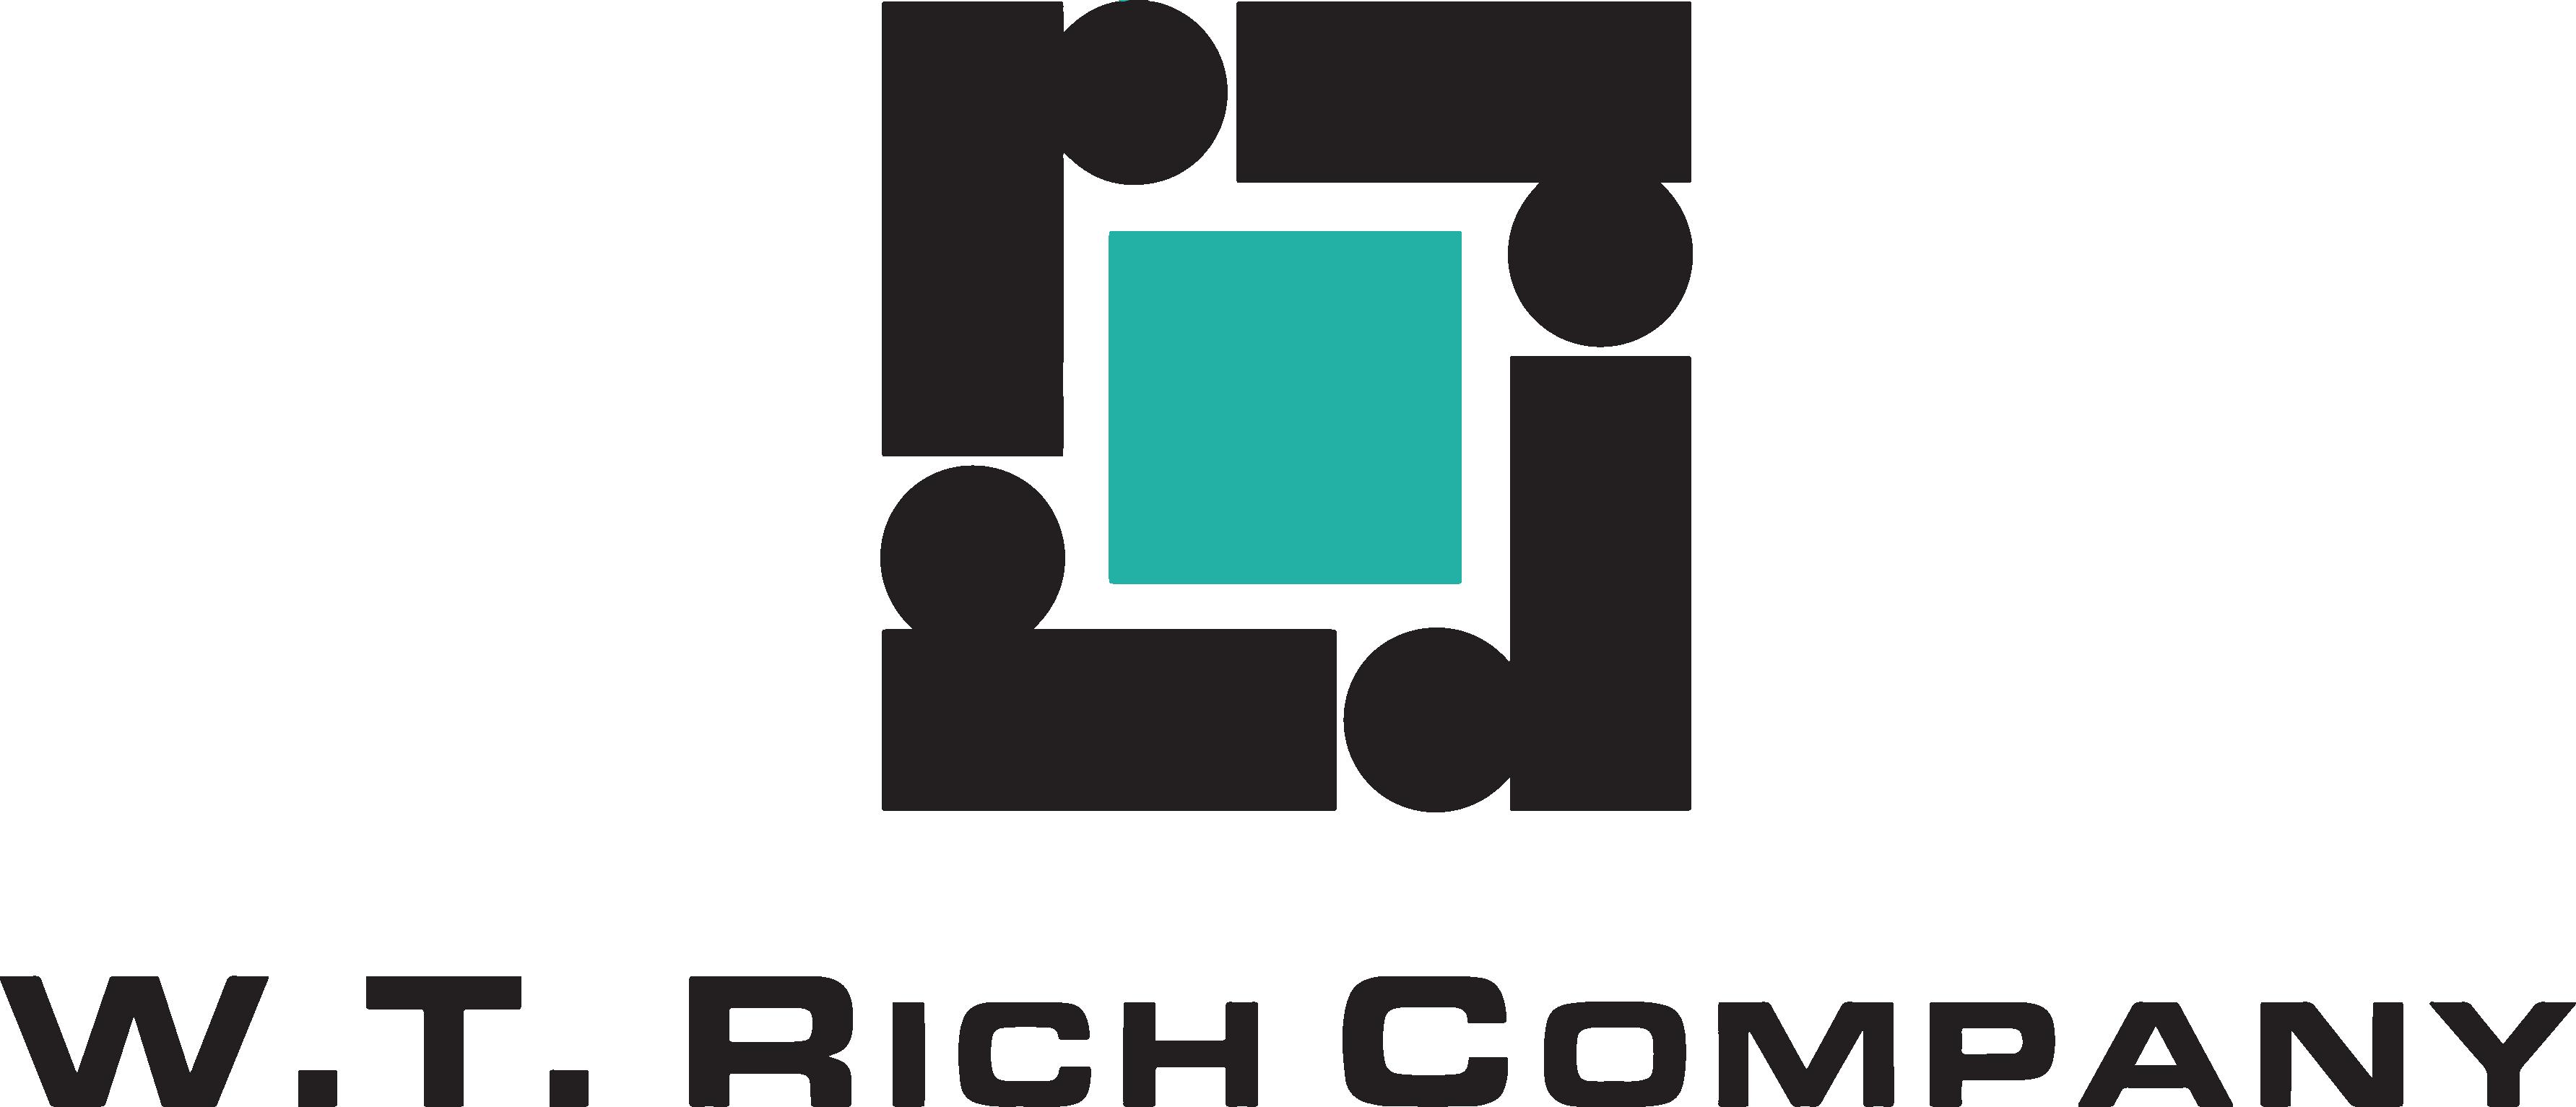 W.T. Rich Company, Inc. logo